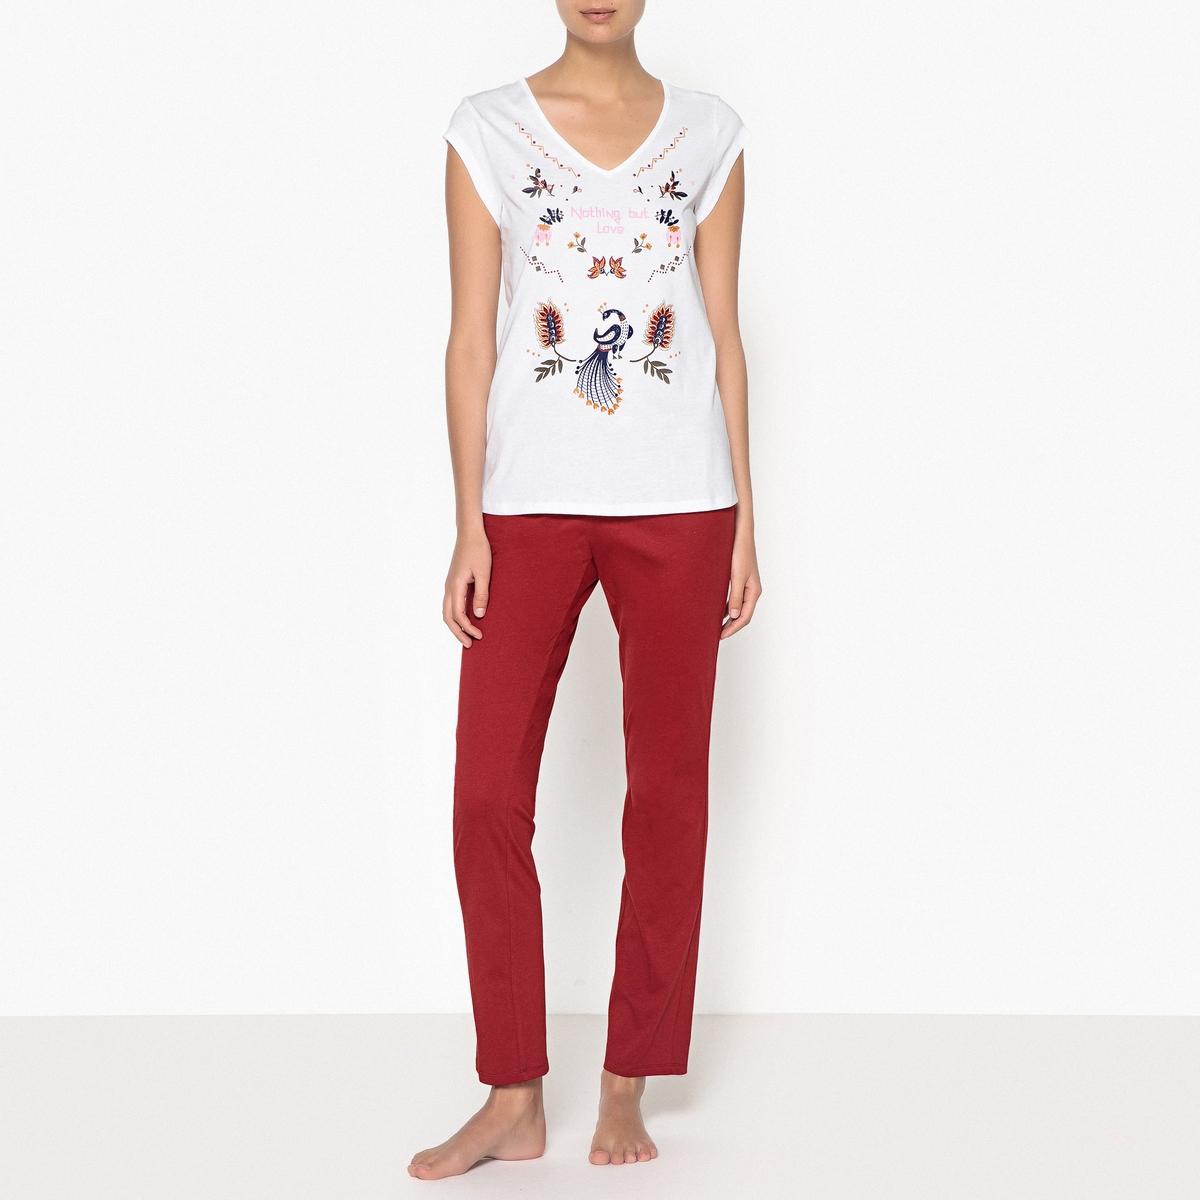 Pijama de algodón estampado